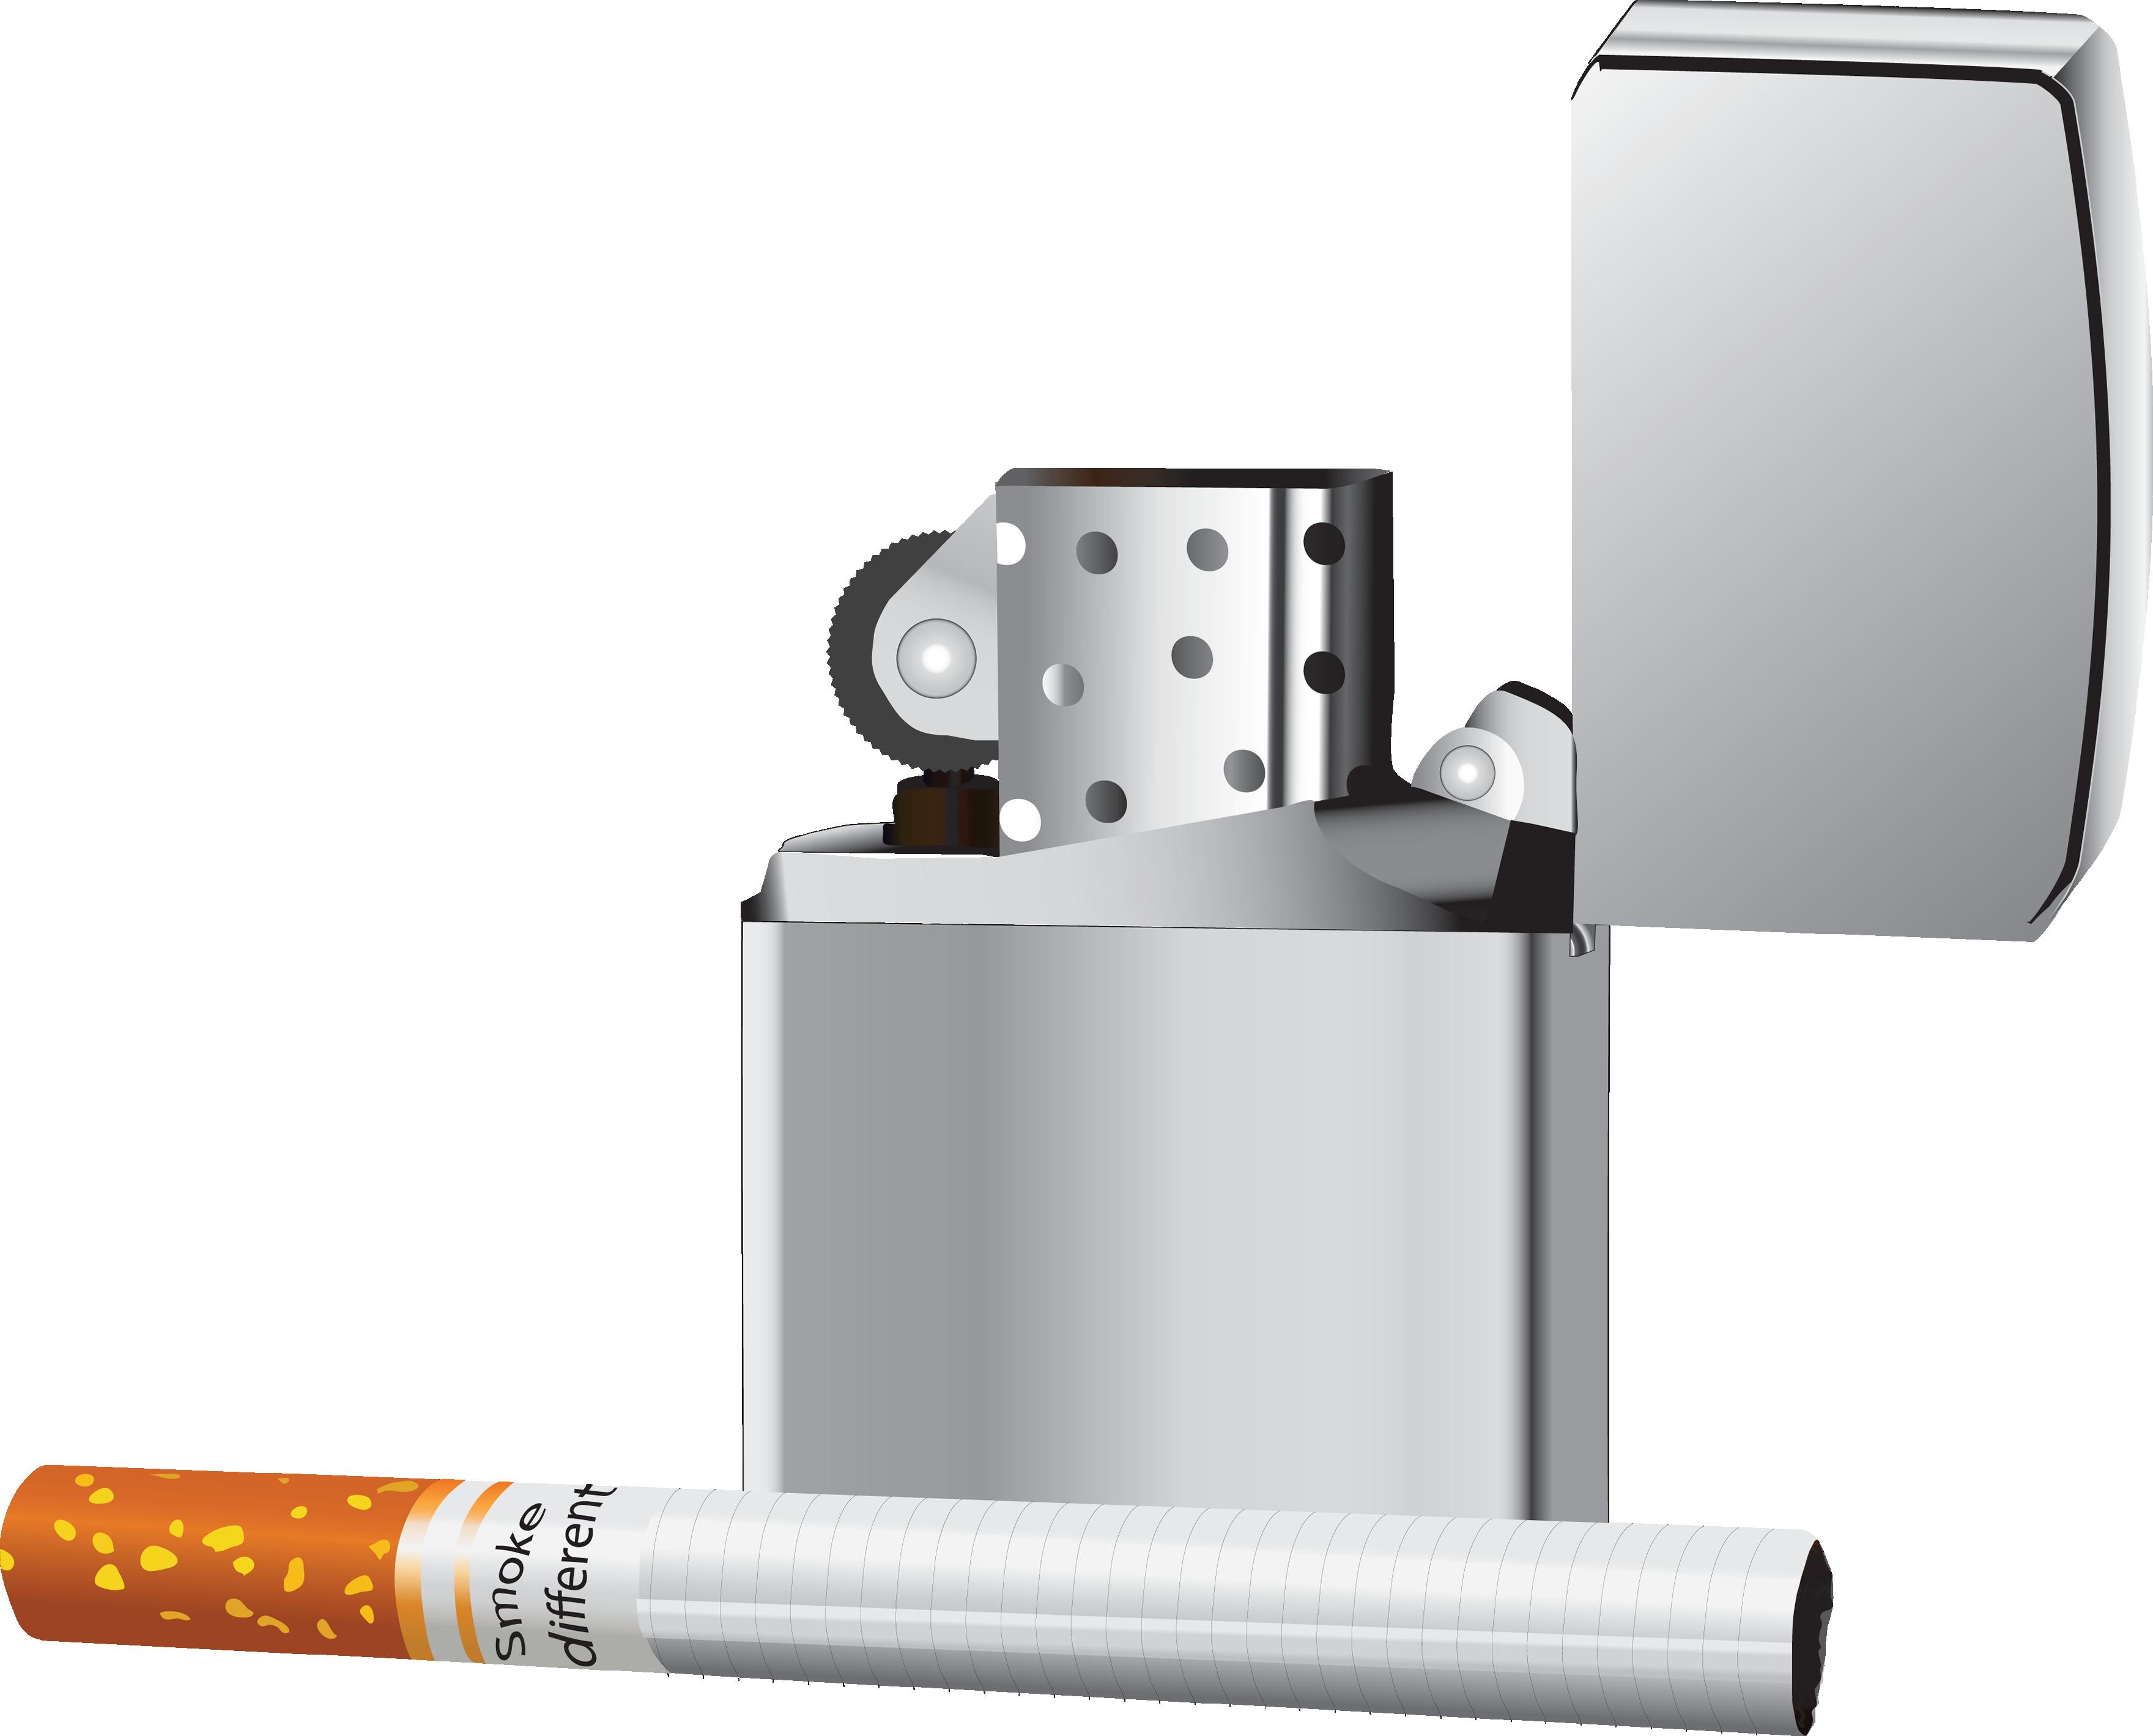 Cigarette PNG Image